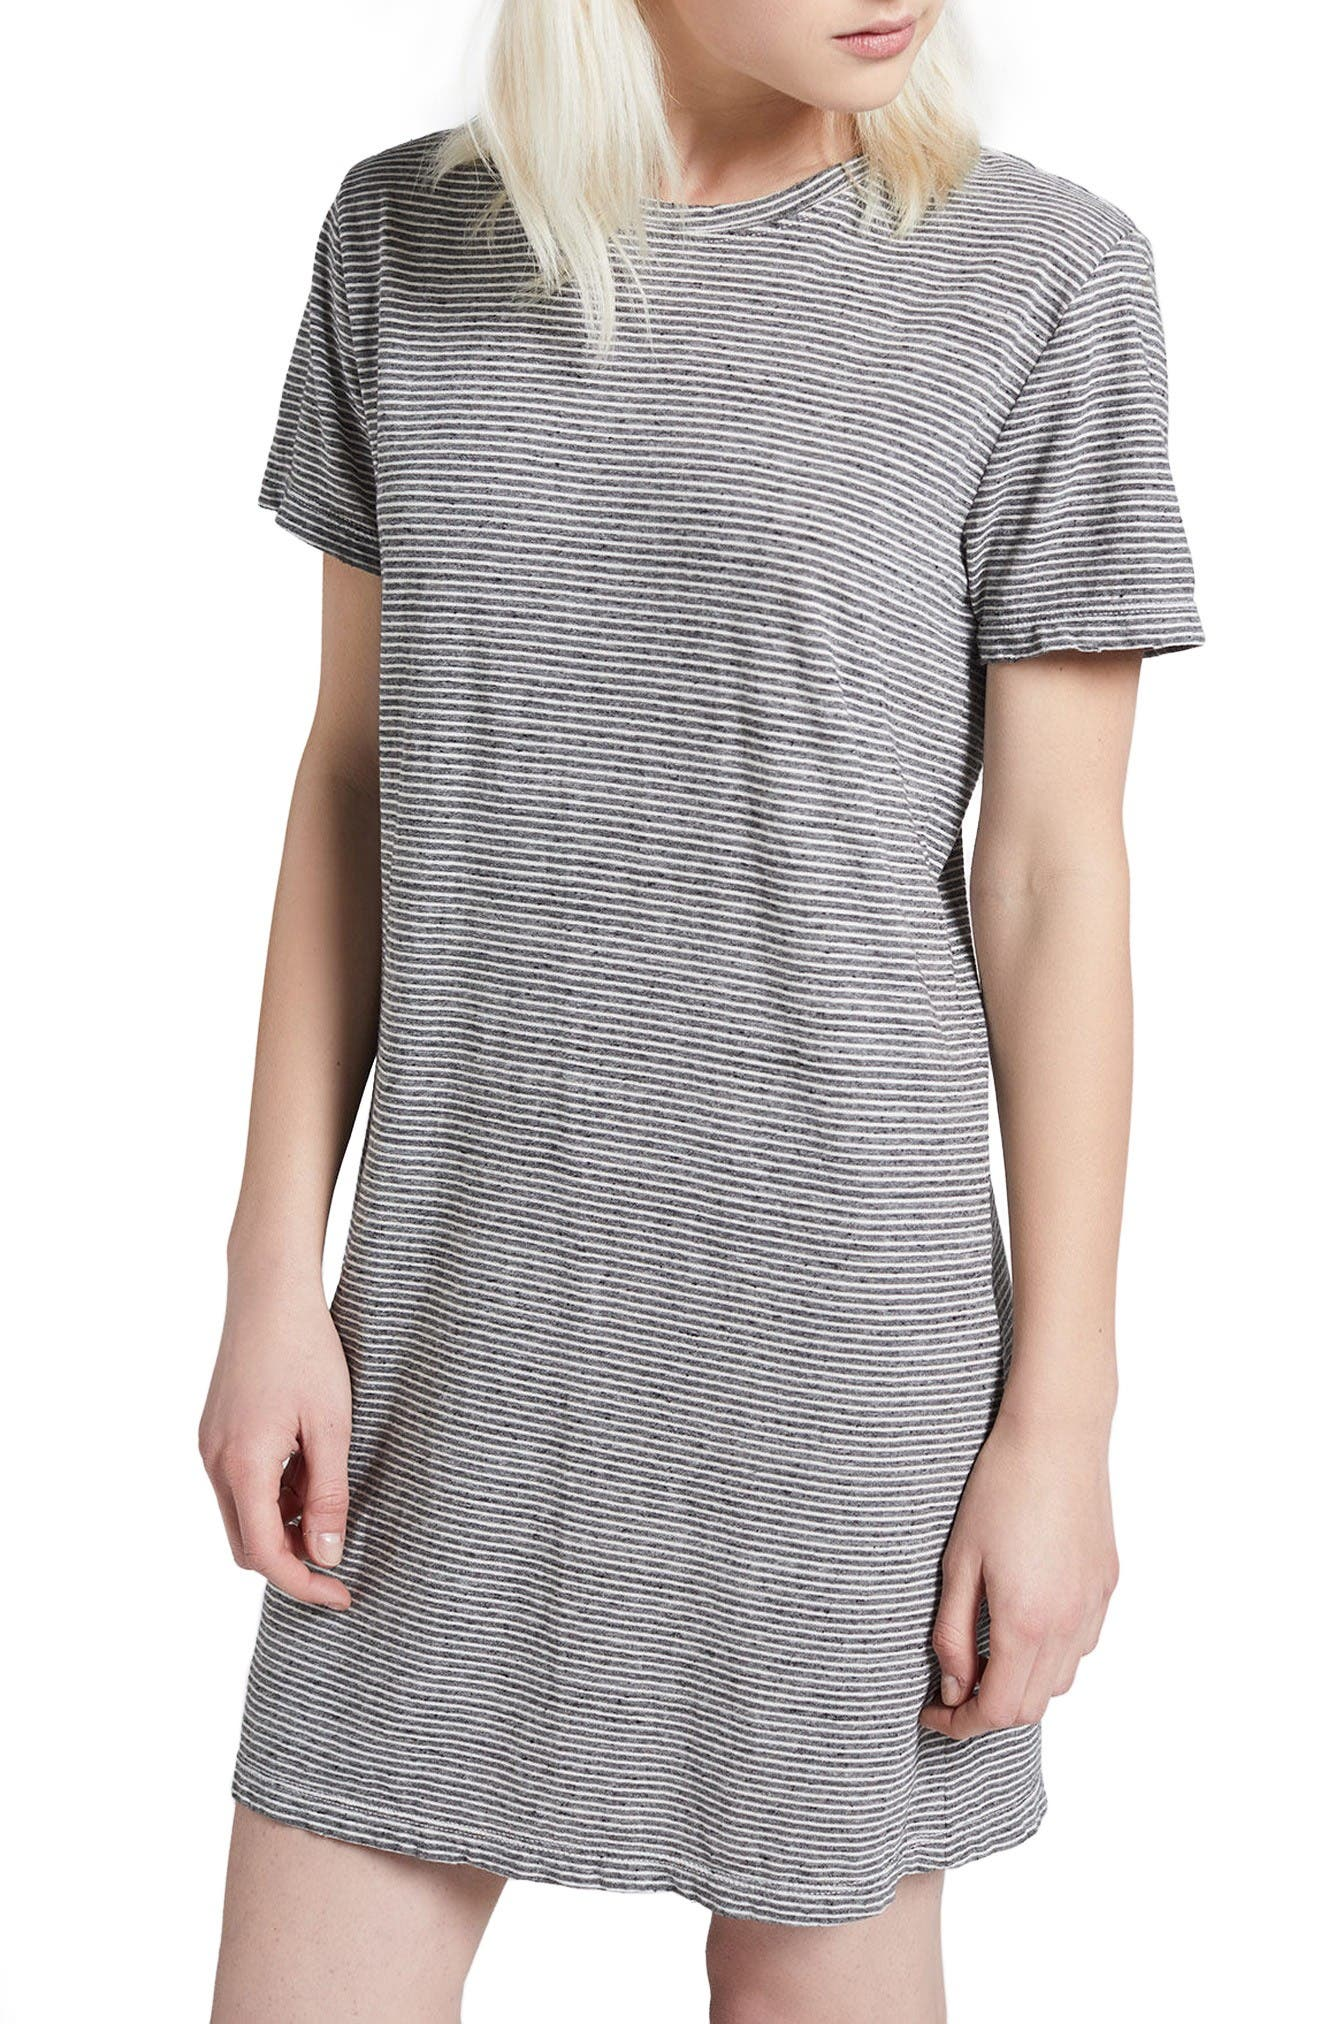 Main Image - Current/Elliott The Beatnik T-Shirt Dress